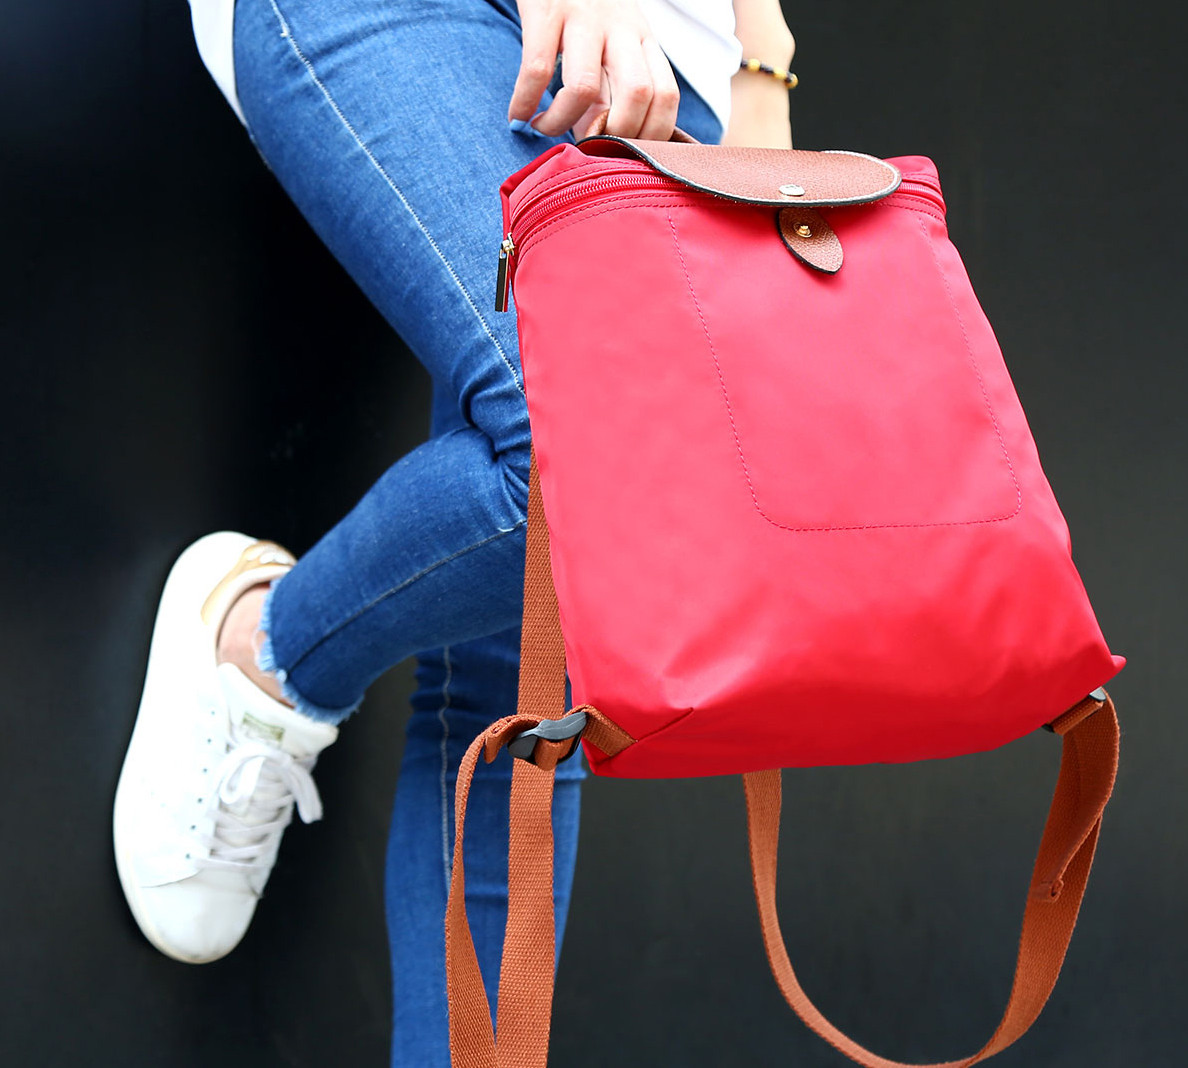 Рюкзак Remax Double 521 Bag Red